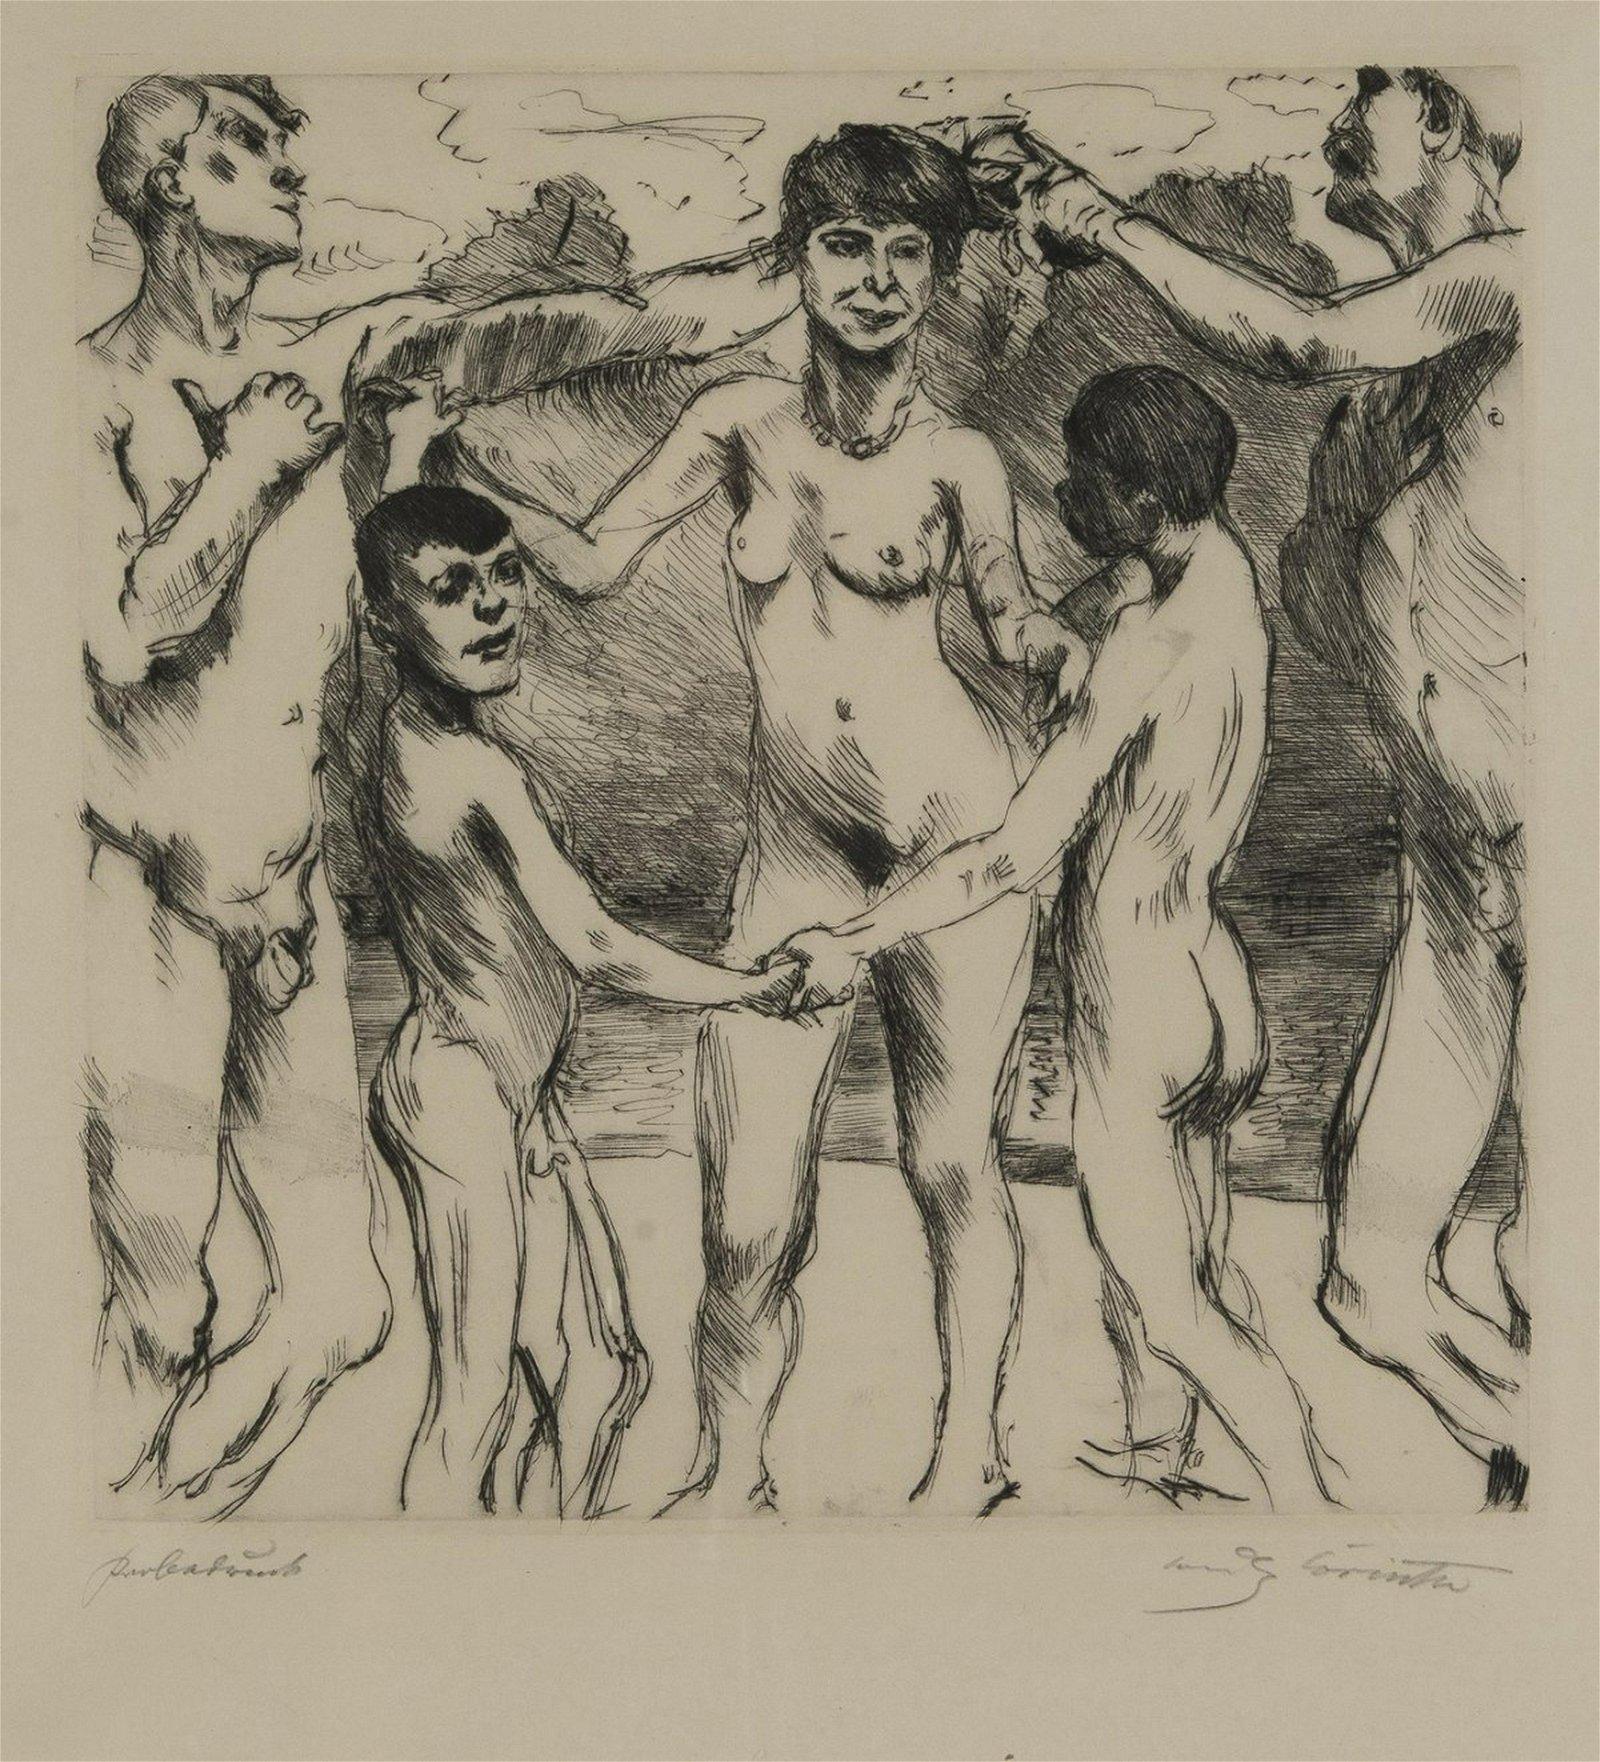 Lovis Corinth, 'Dancers on the beach', 1917